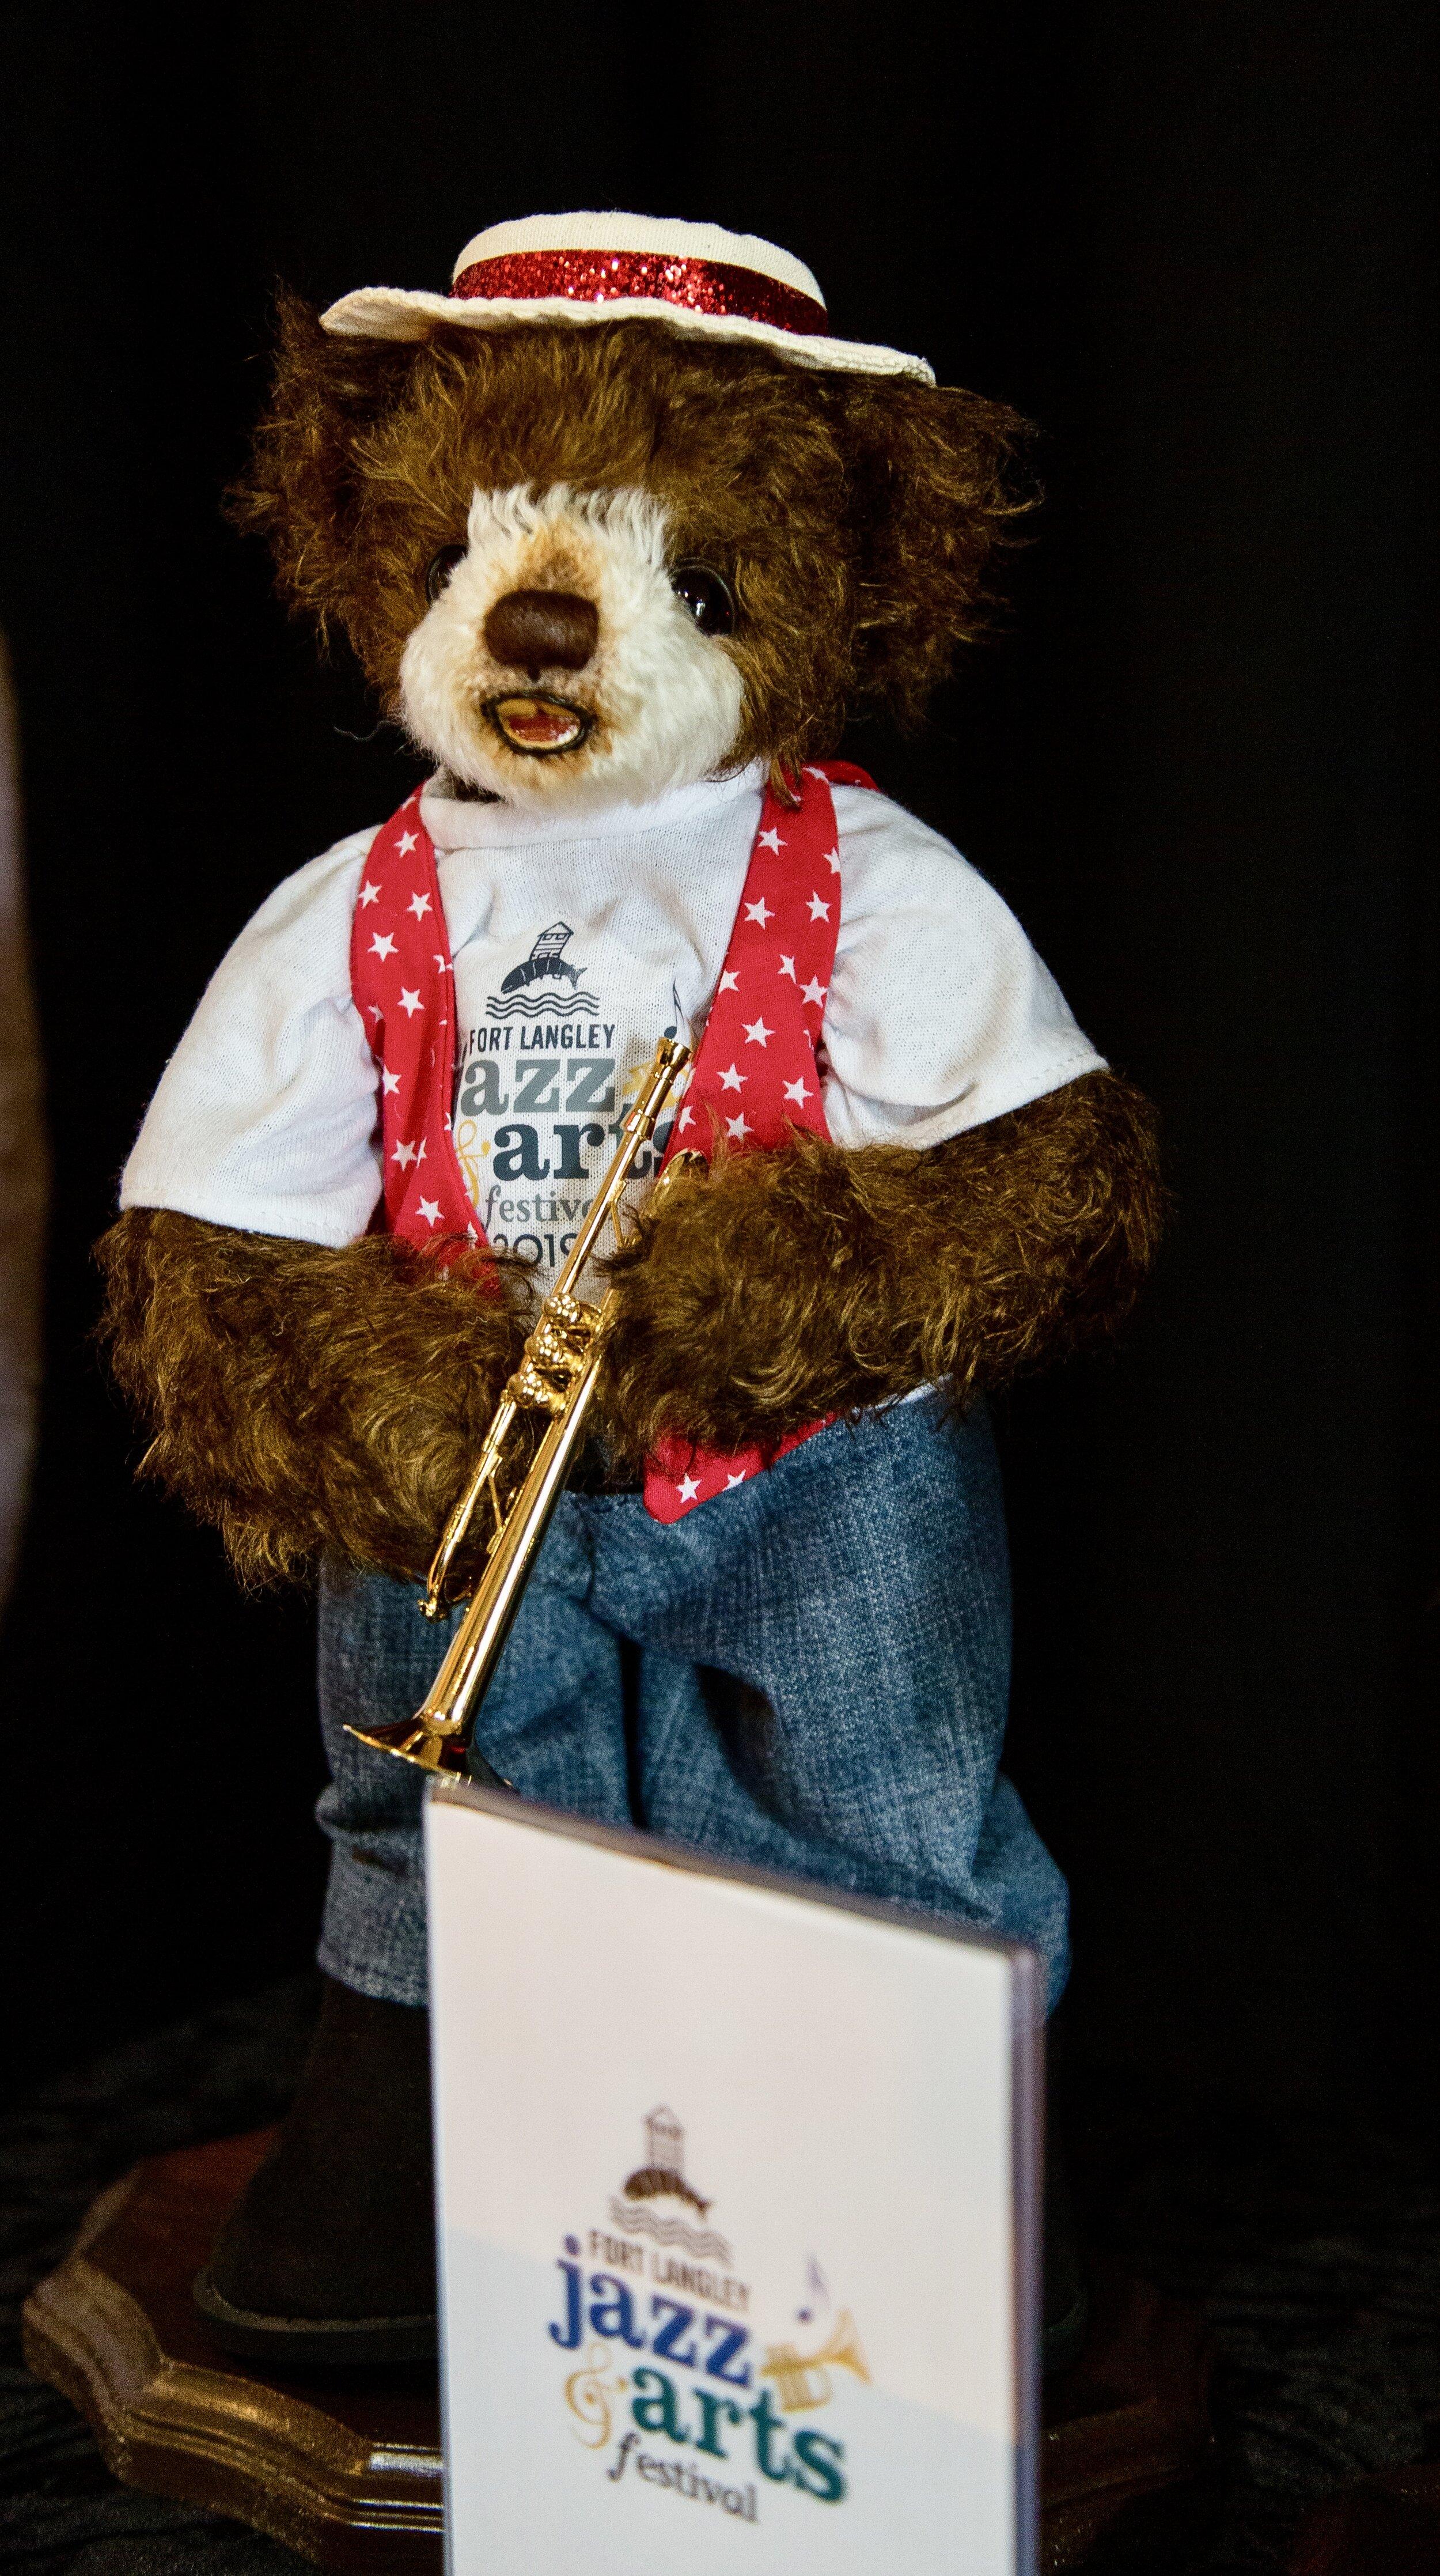 The 2019 Fort Langley Jazz & Arts Festival Commemorative Jazz Bear